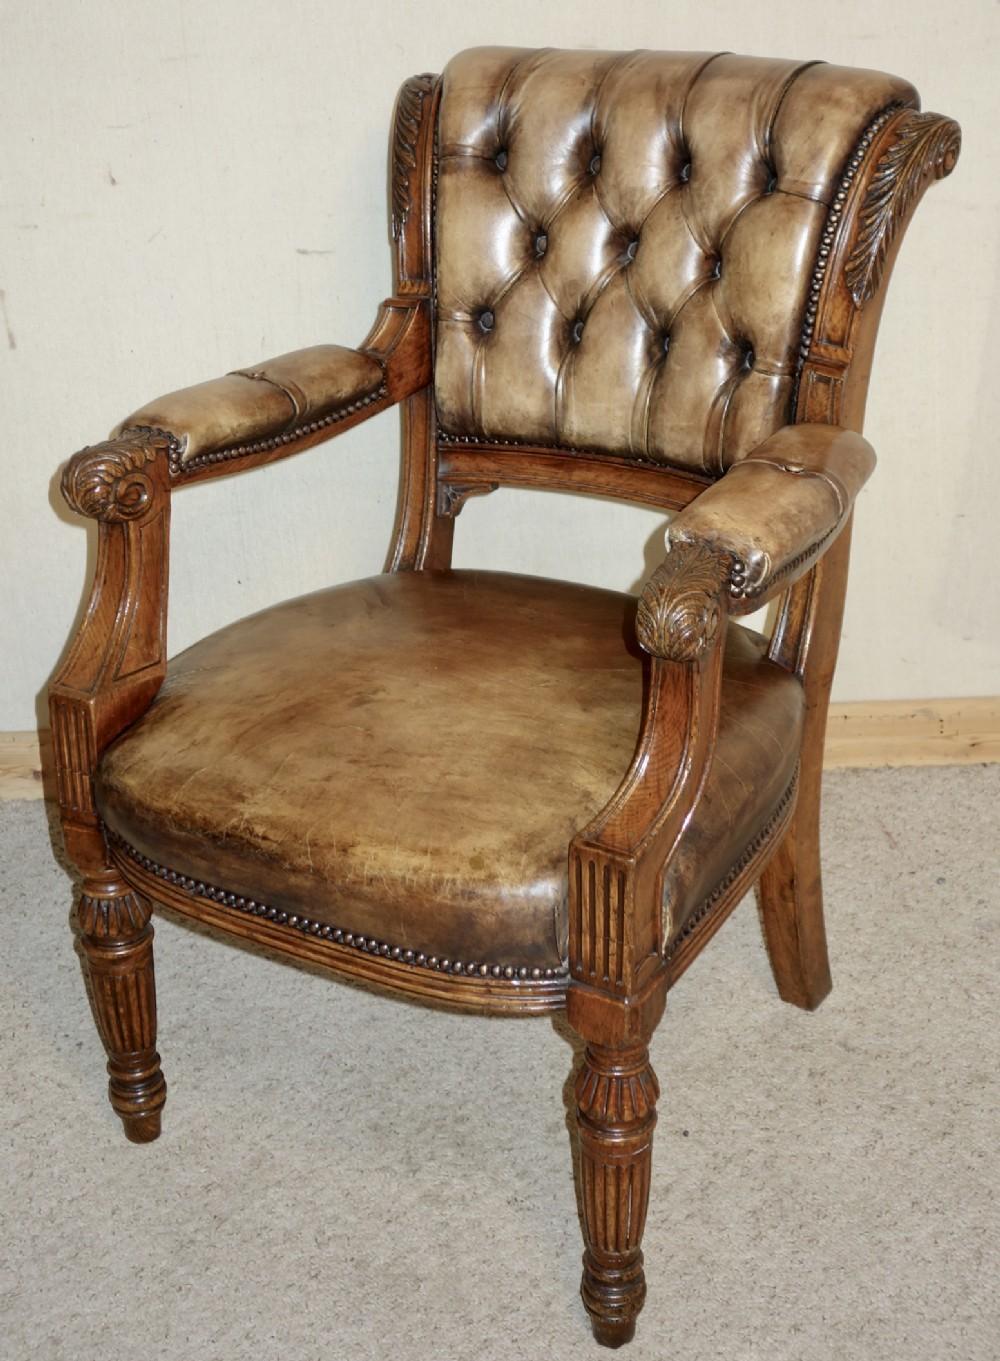 Admirable Jackie Oconnor Victorian Era Inspired Leather Chair Inzonedesignstudio Interior Chair Design Inzonedesignstudiocom